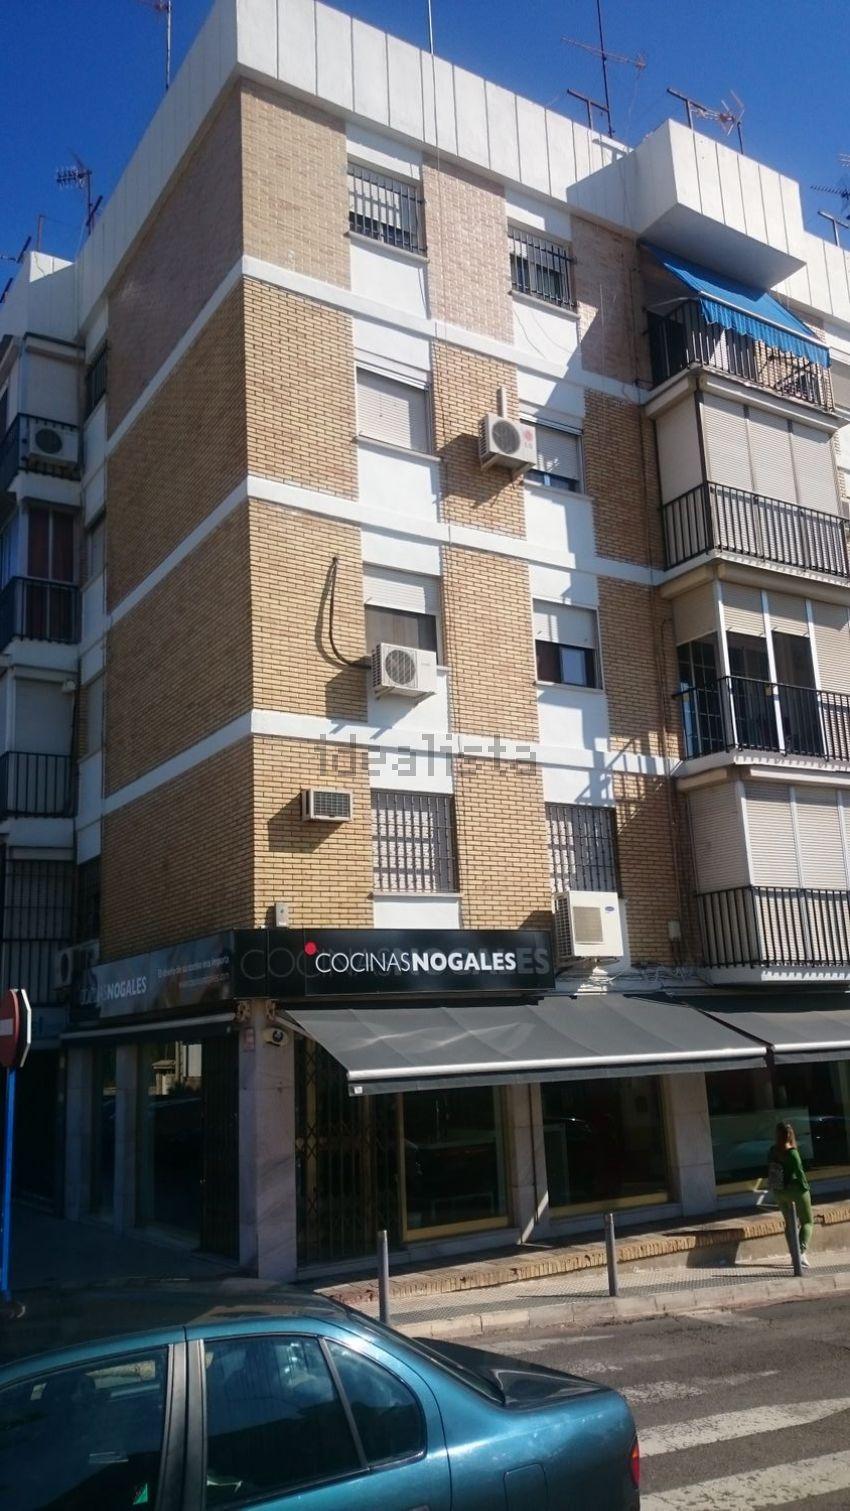 Piso en avenida de Mairena, 7, Lepanto, Mairena del Aljarafe